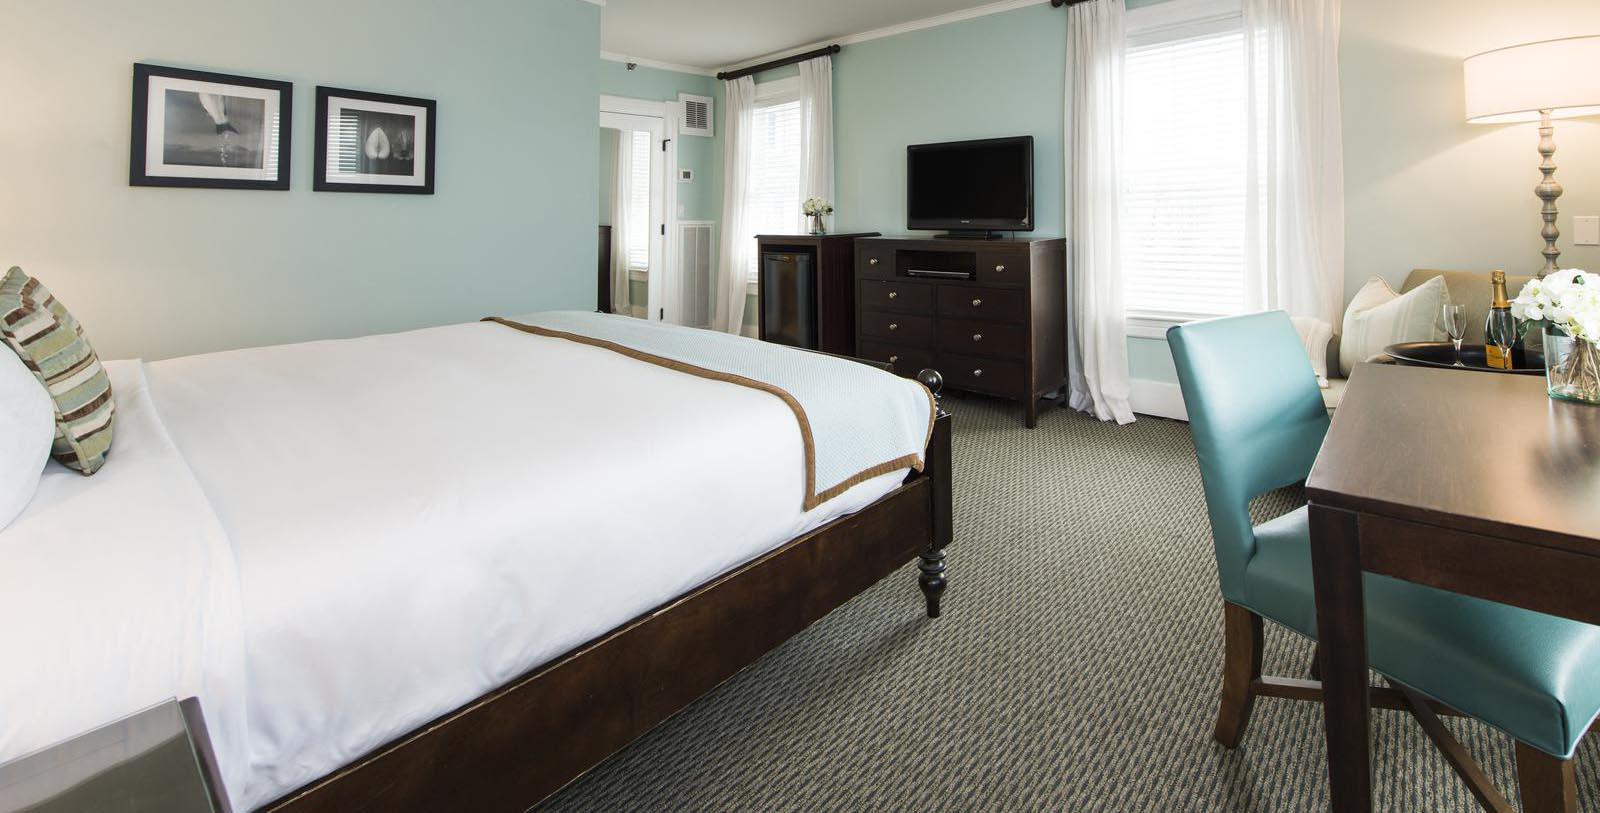 Image of Guestroom Harbor View Hotel of Martha's Vineyard, 1891, Member of Historic Hotels of America, Edgartown, Massachusetts, Accommodations